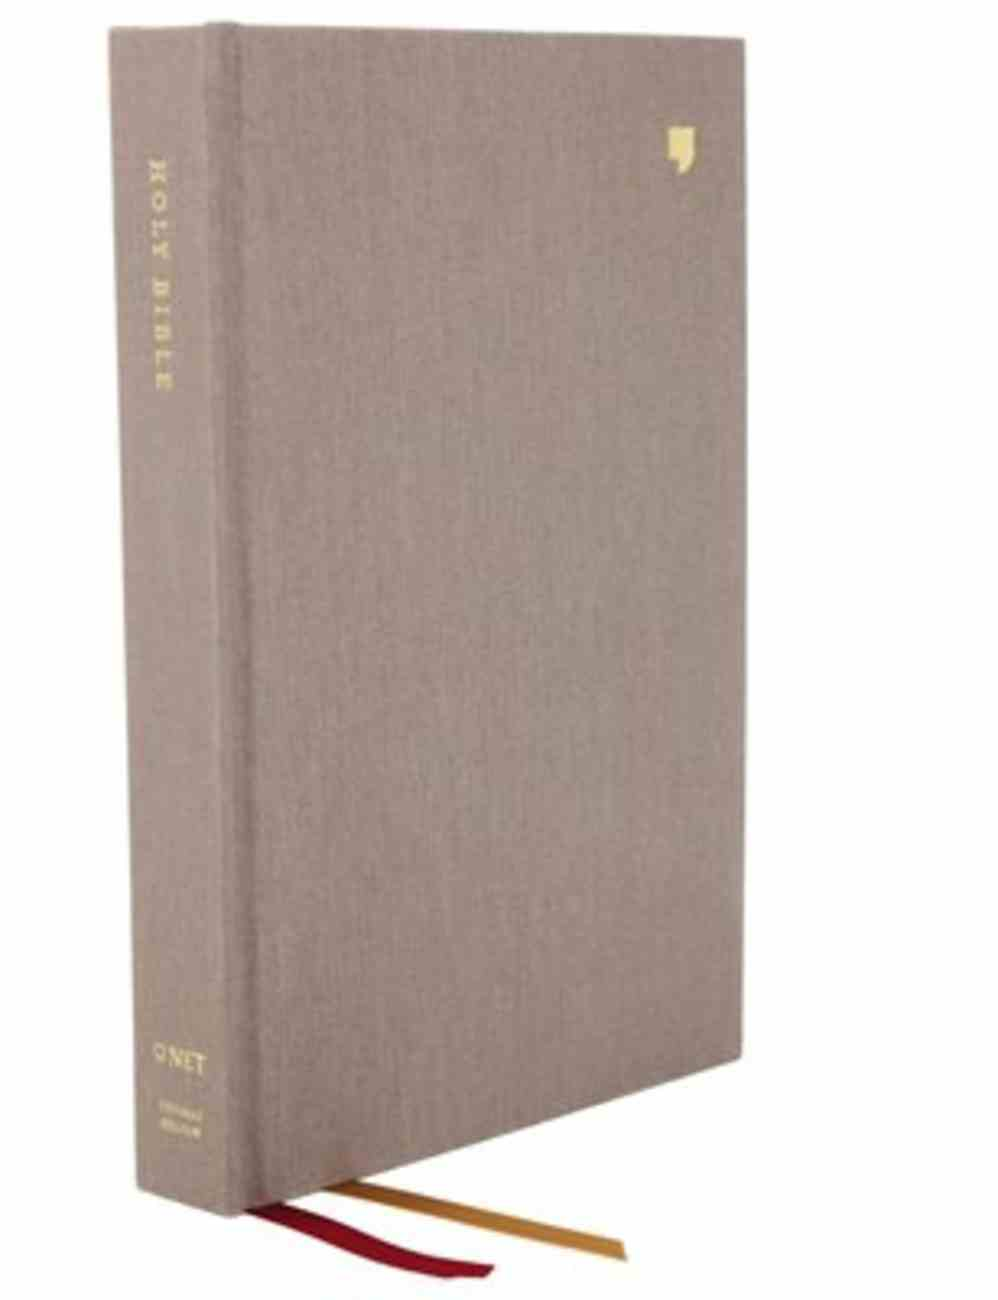 NET Bible Thinline Gray Fabric Over Hardback